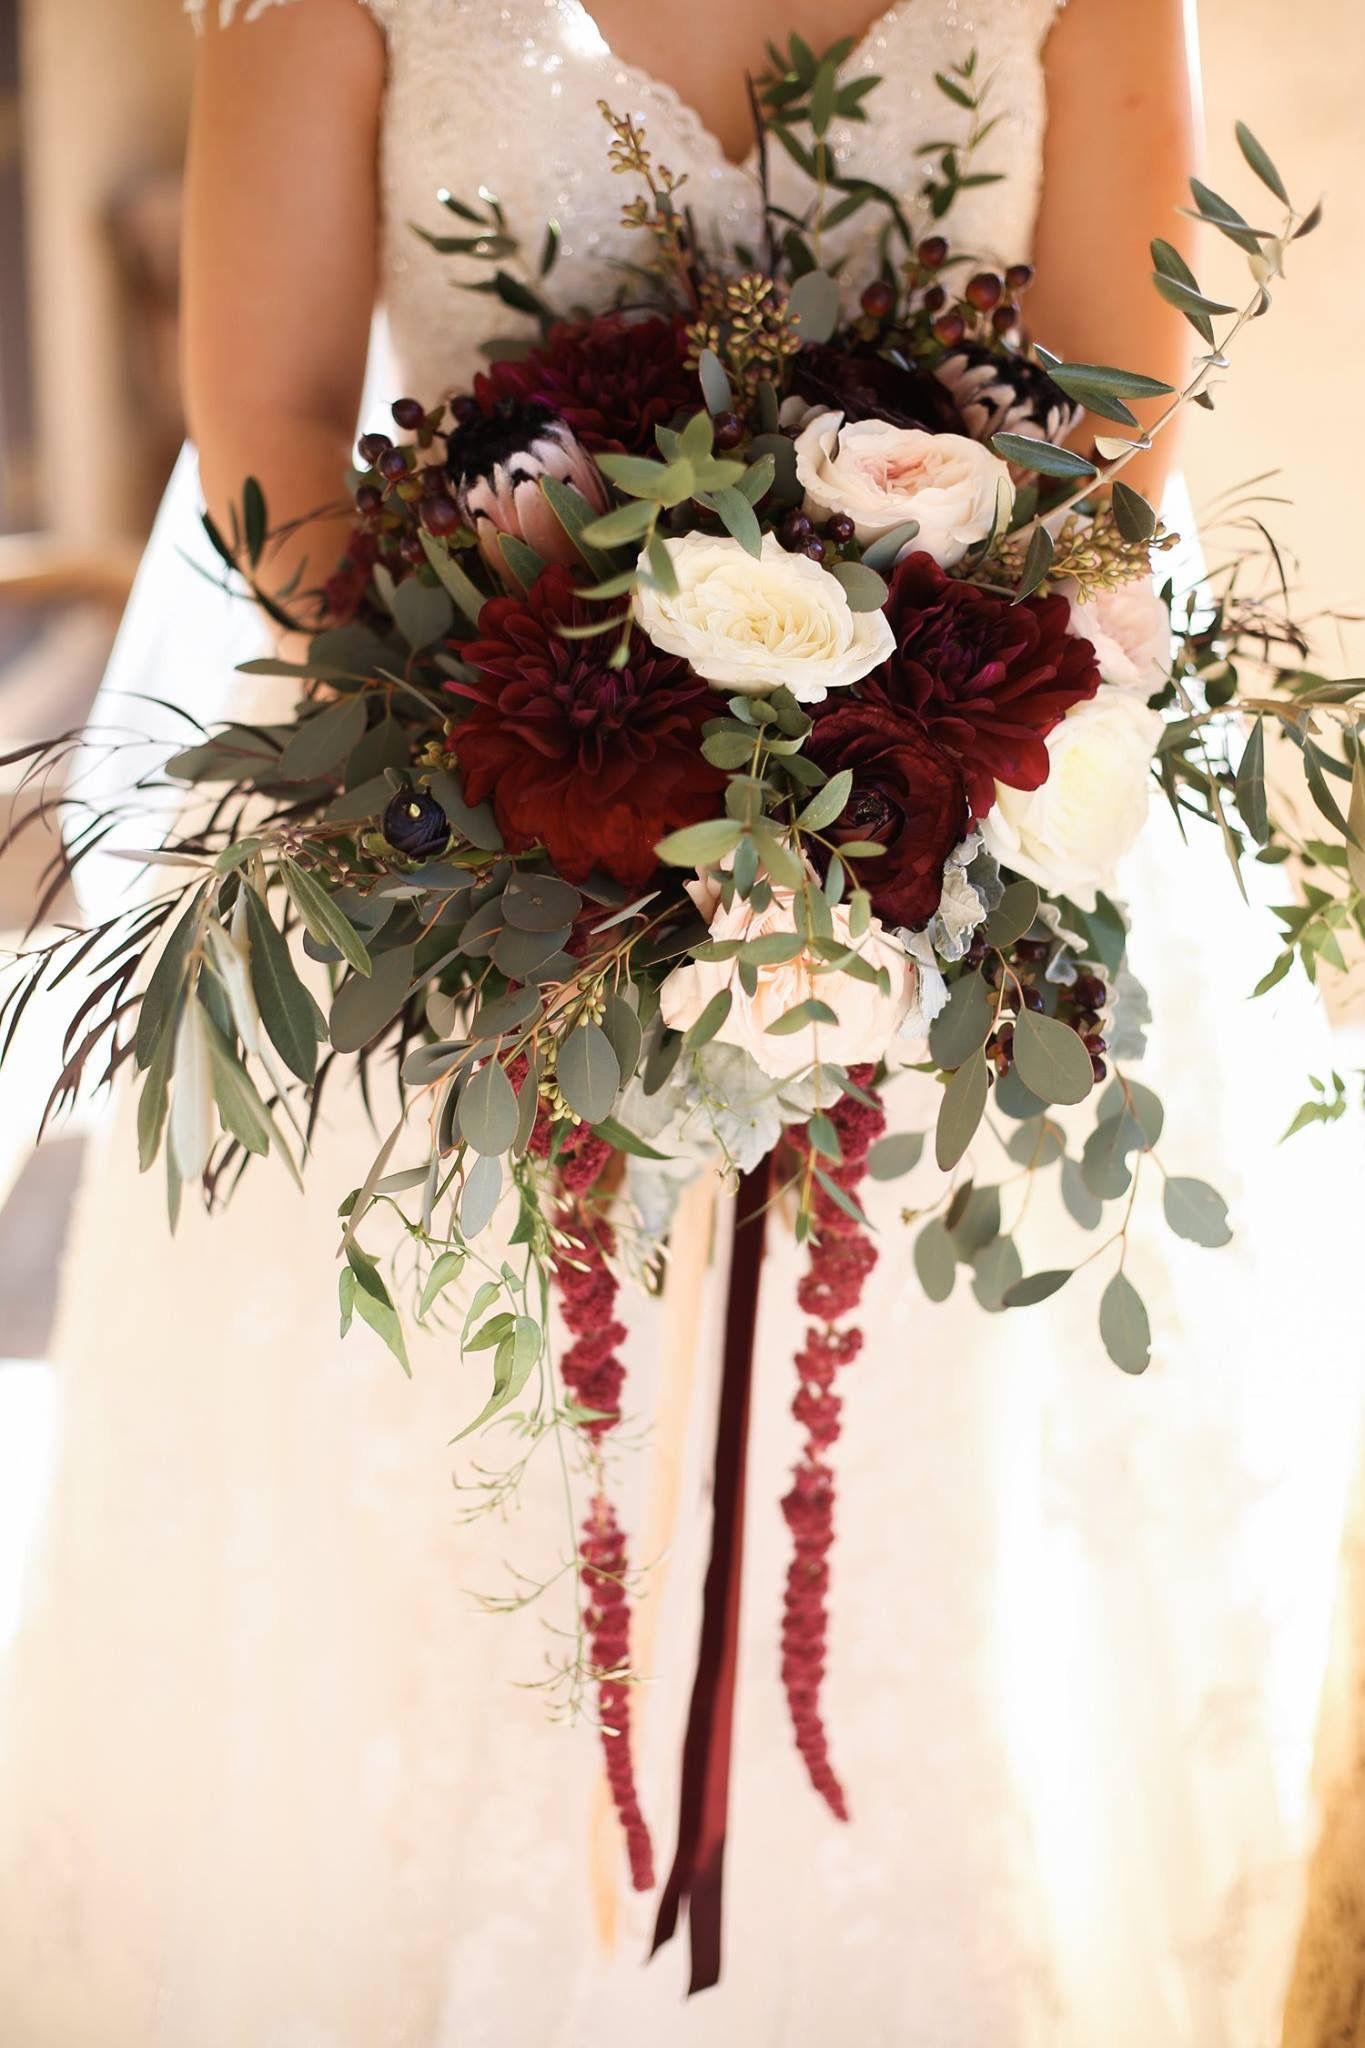 Bridal bouquet, wedding flowers, blush, gold, burgundy